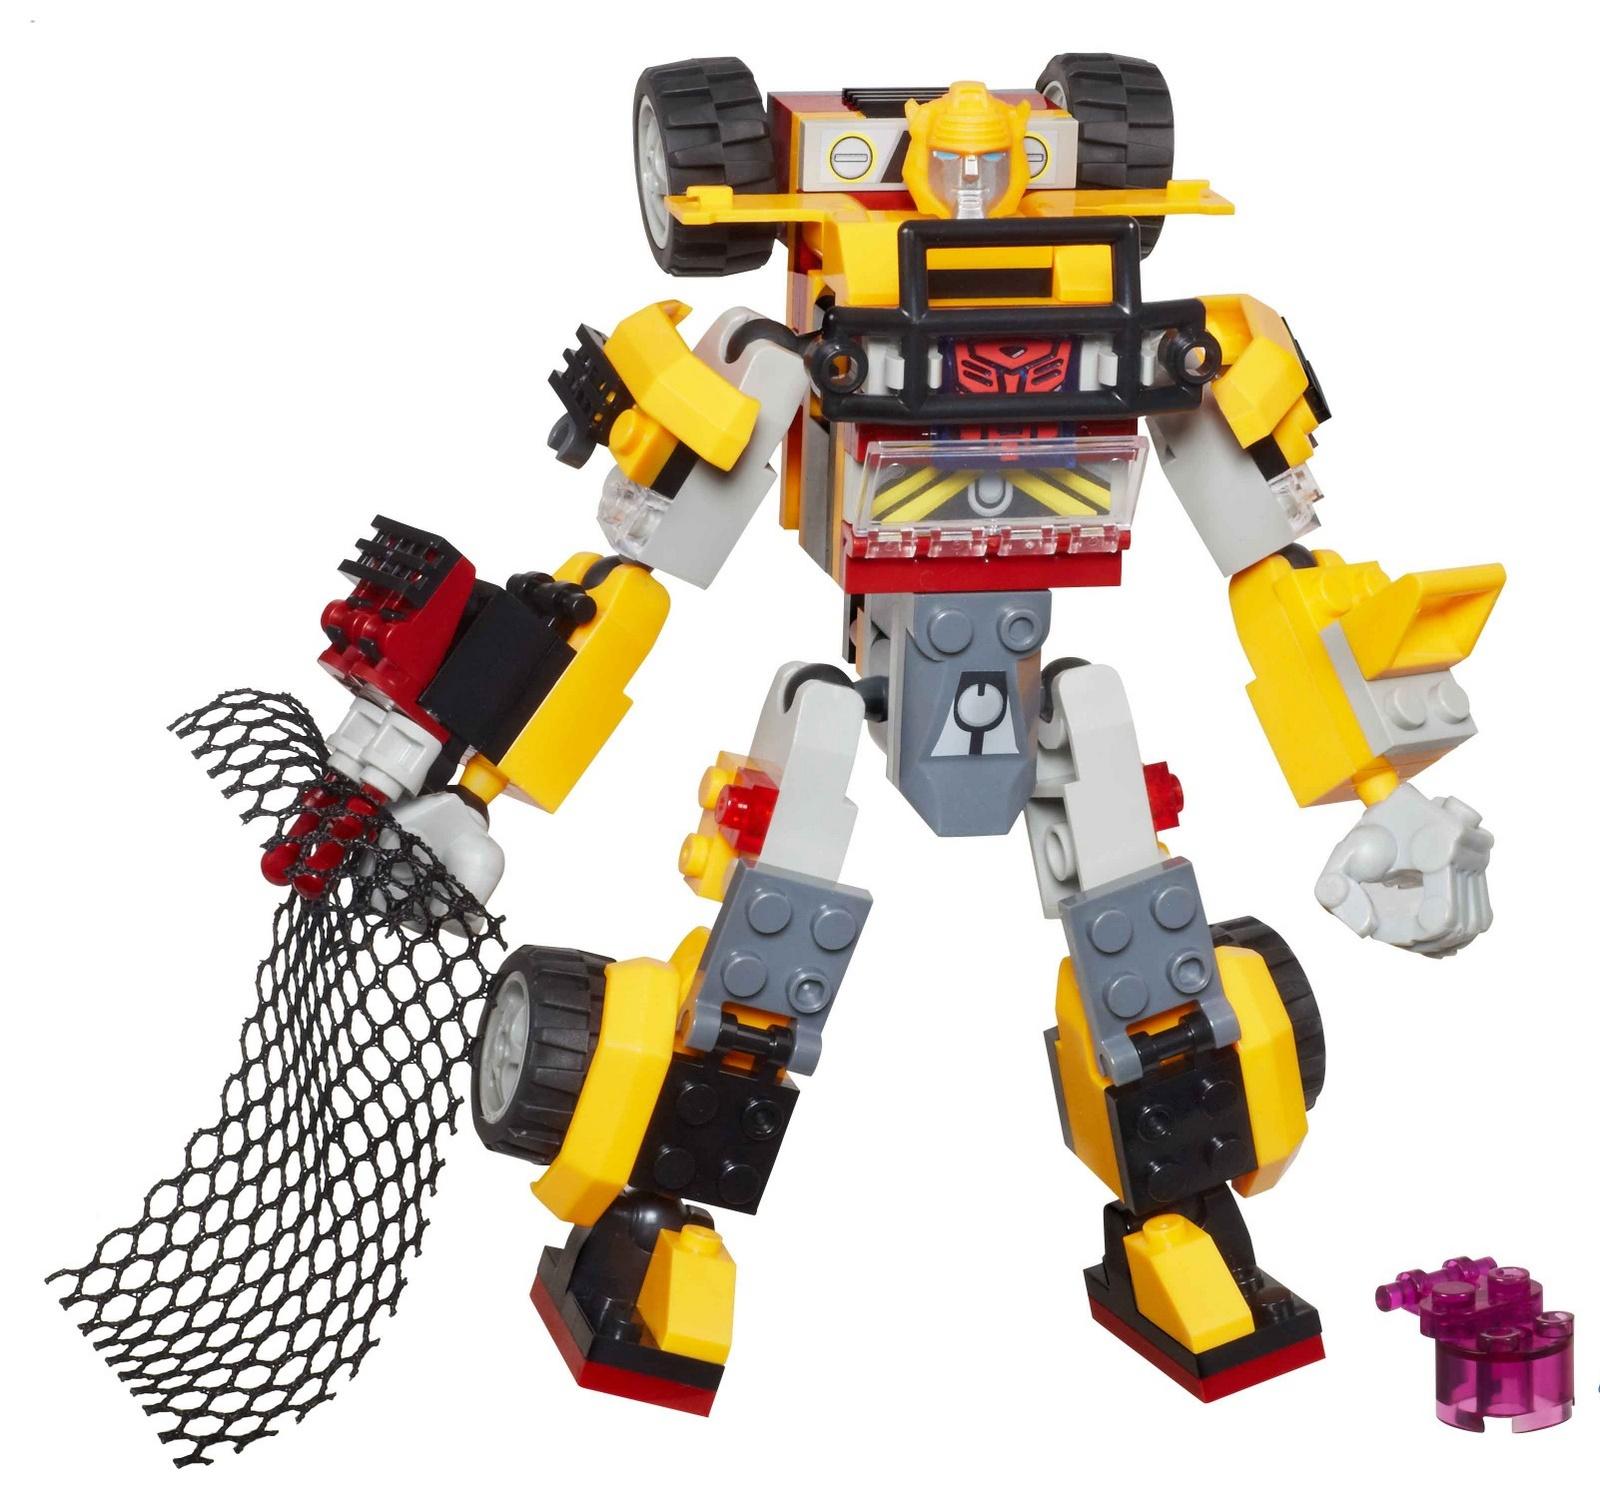 Bumblebee Battle Net Transformers Toys Tfw2005